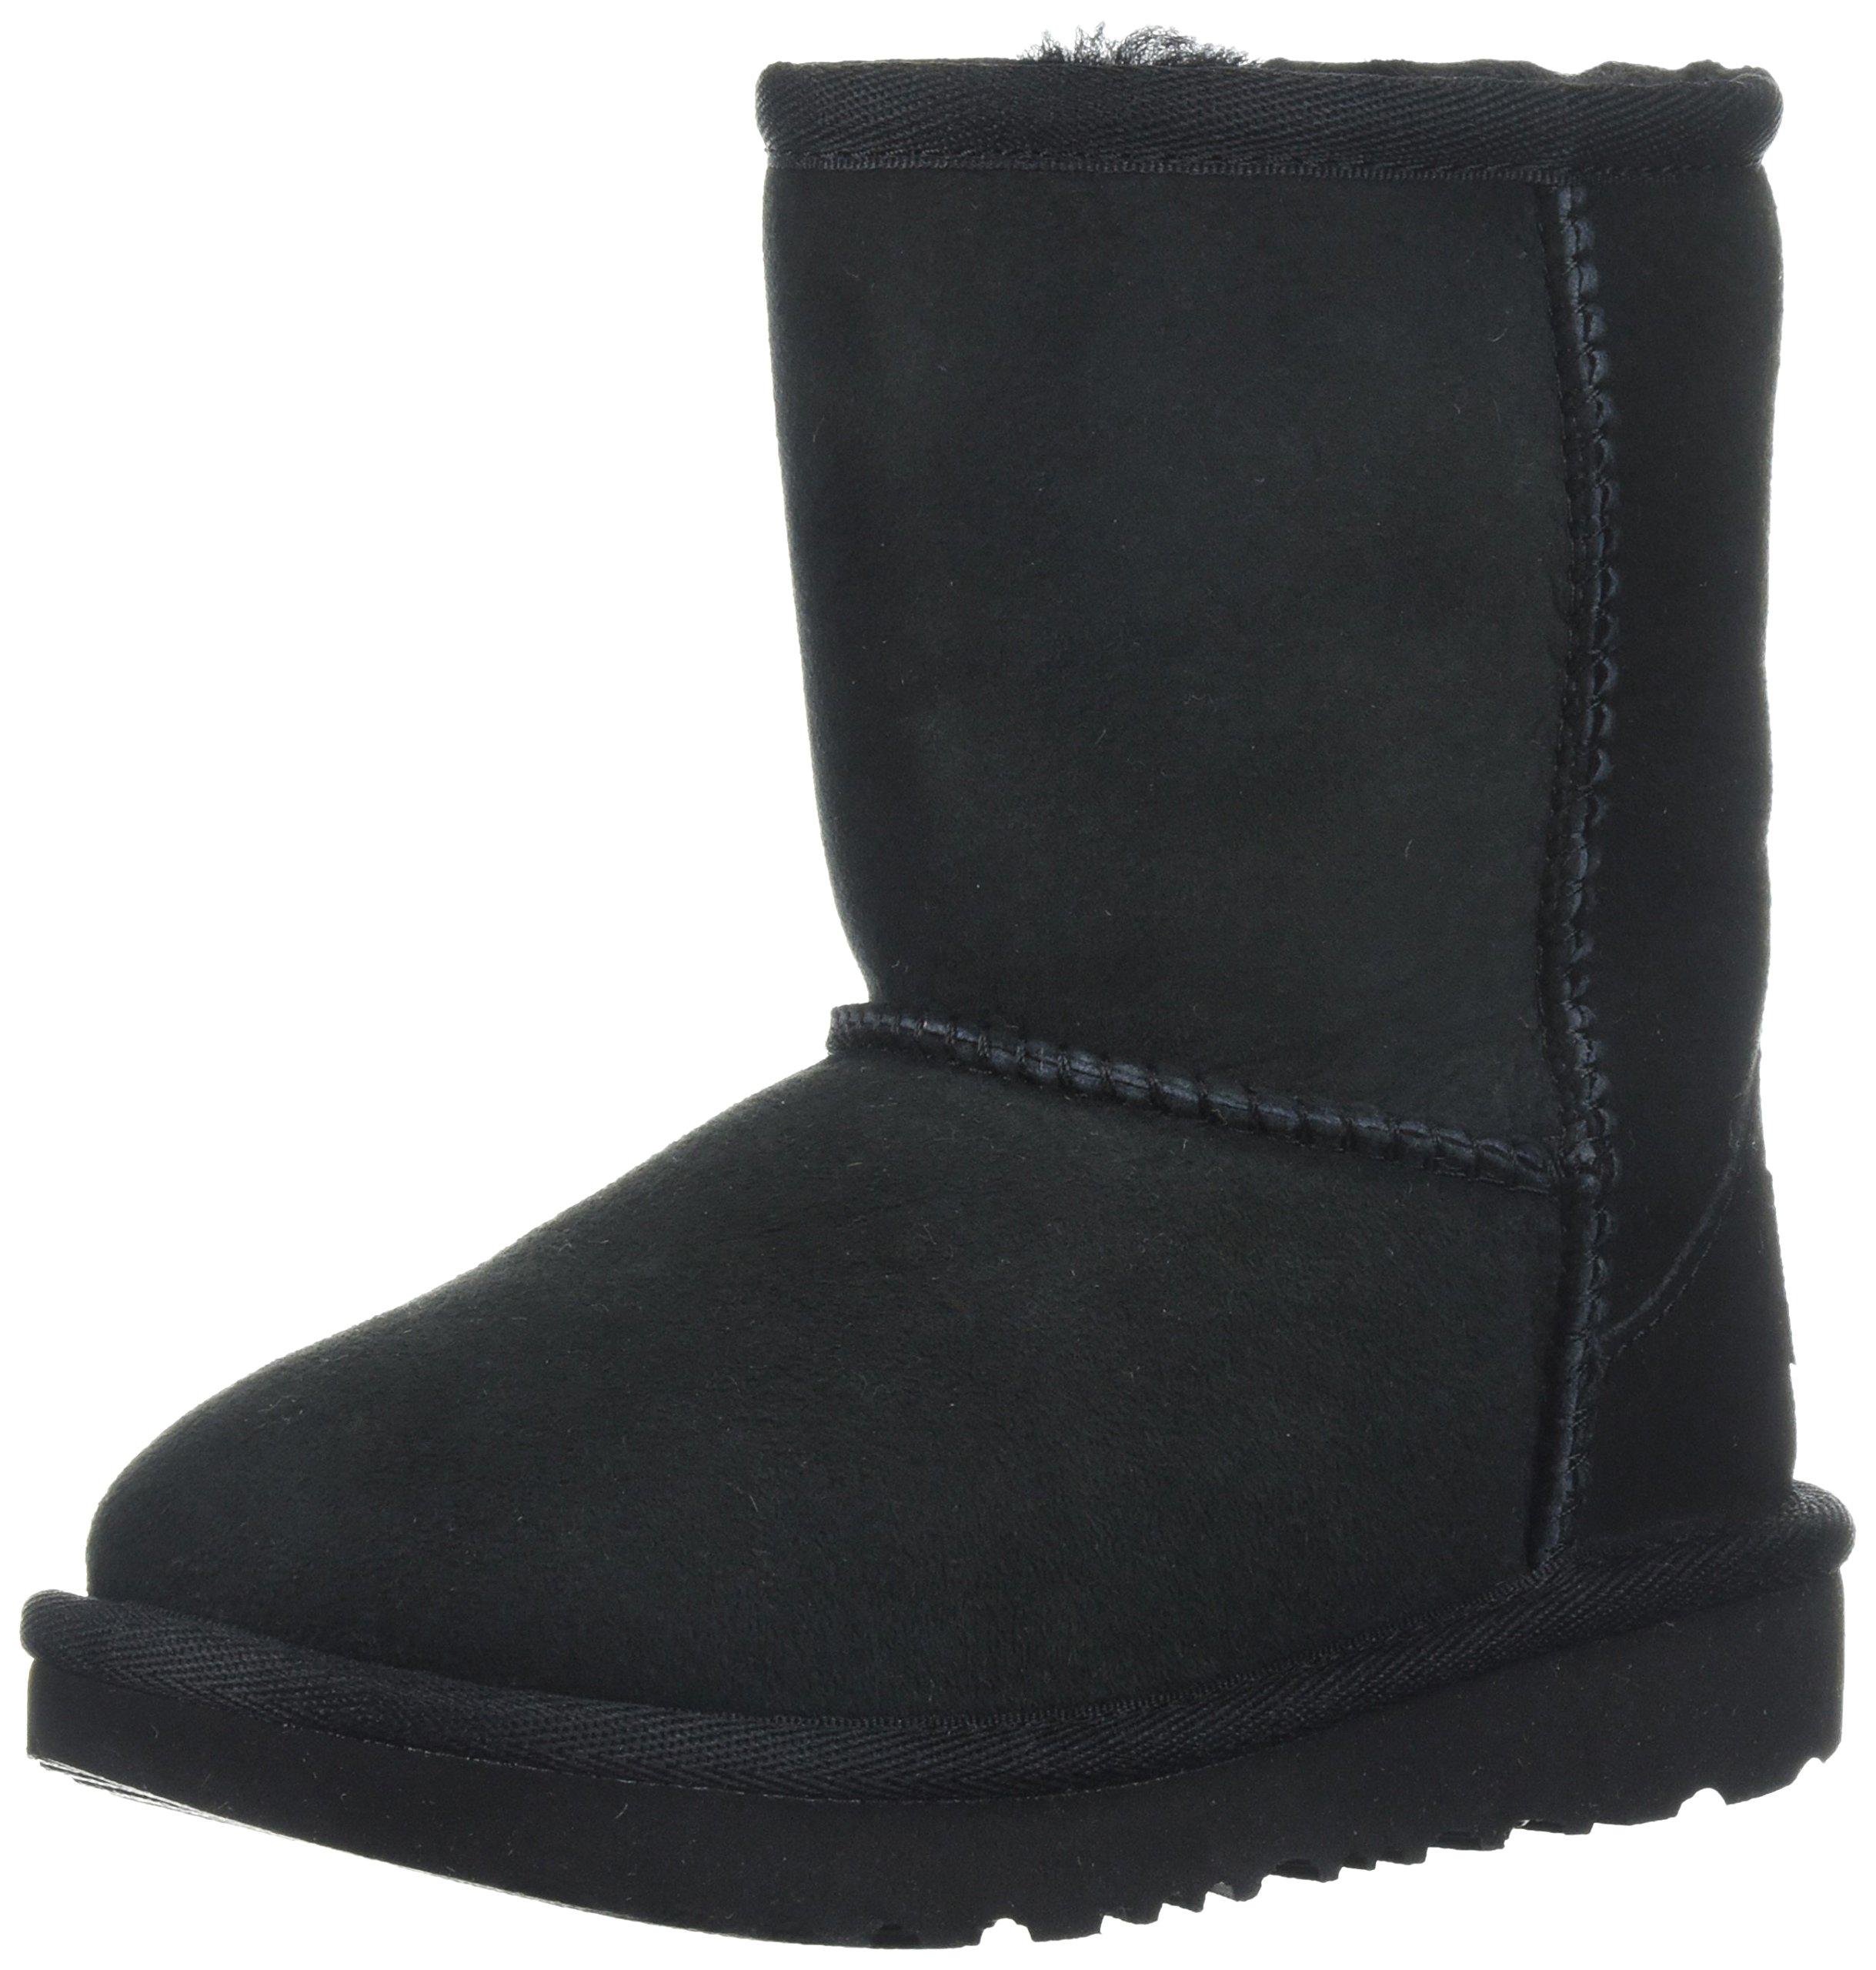 UGG Kids T Classic II Fashion Boot, Black, 8 M US Toddler